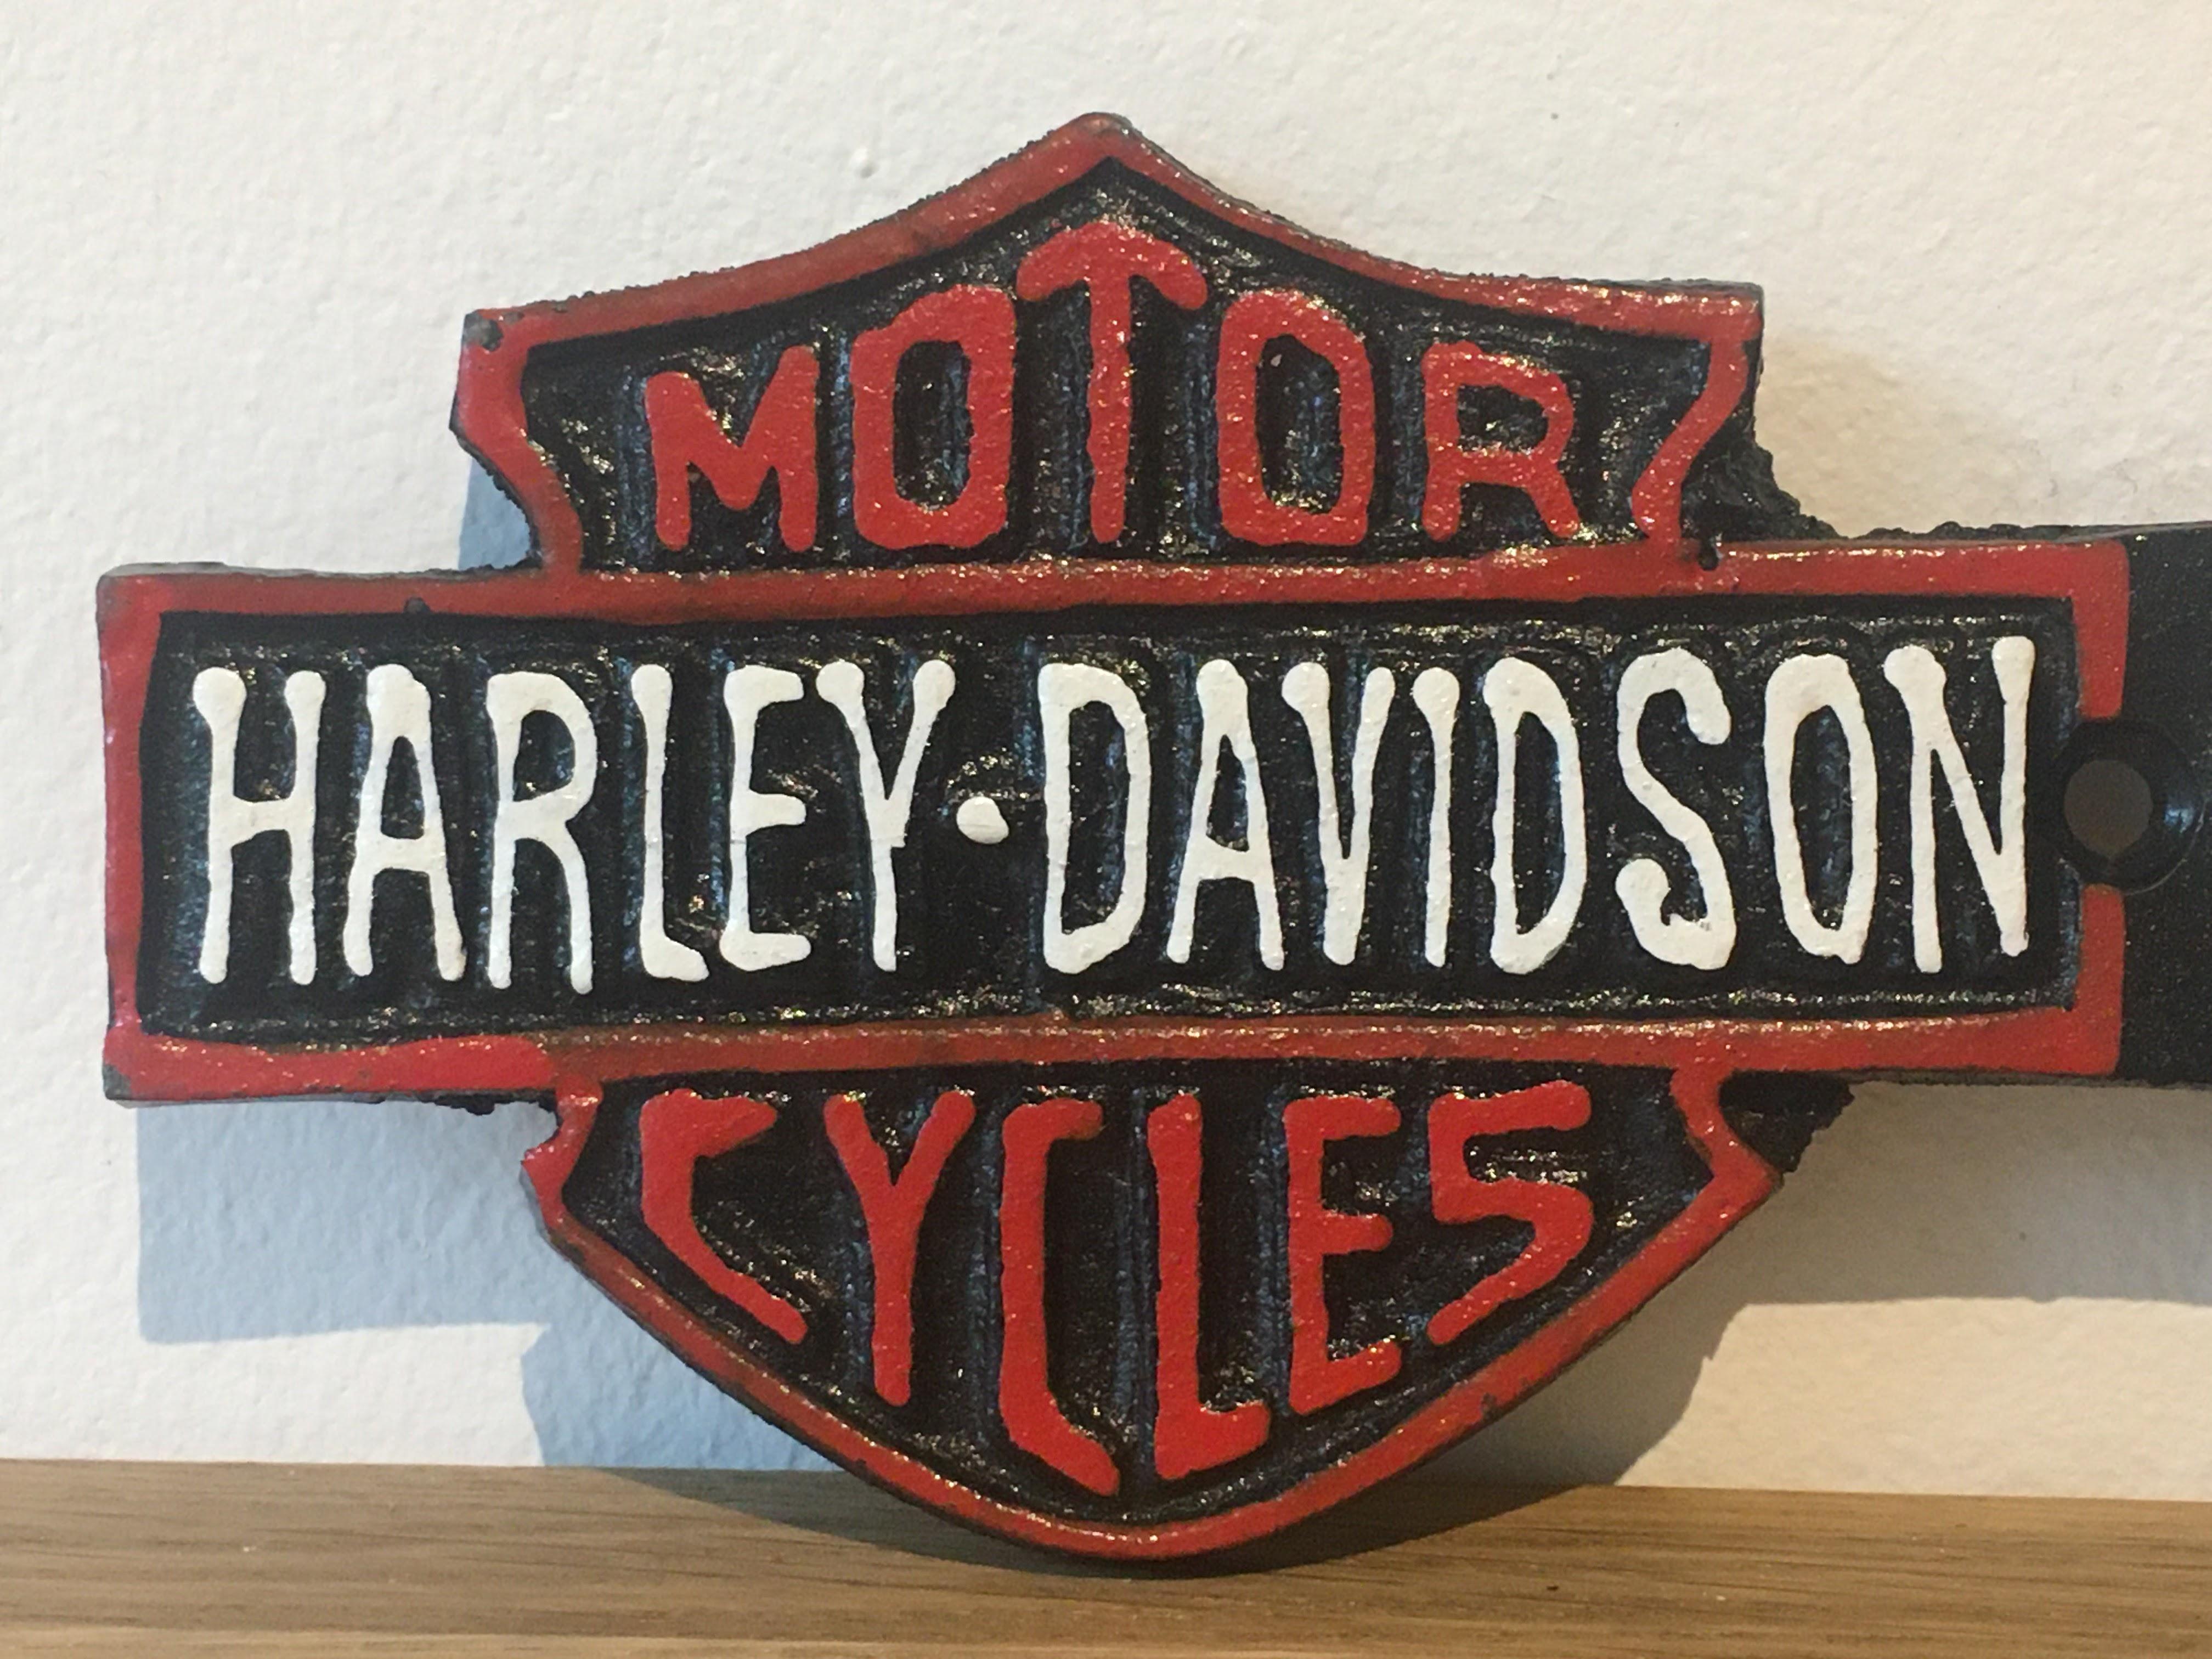 Harley Davidson Motorcycles Cast Iron Garage Arrow Sign - Image 2 of 4